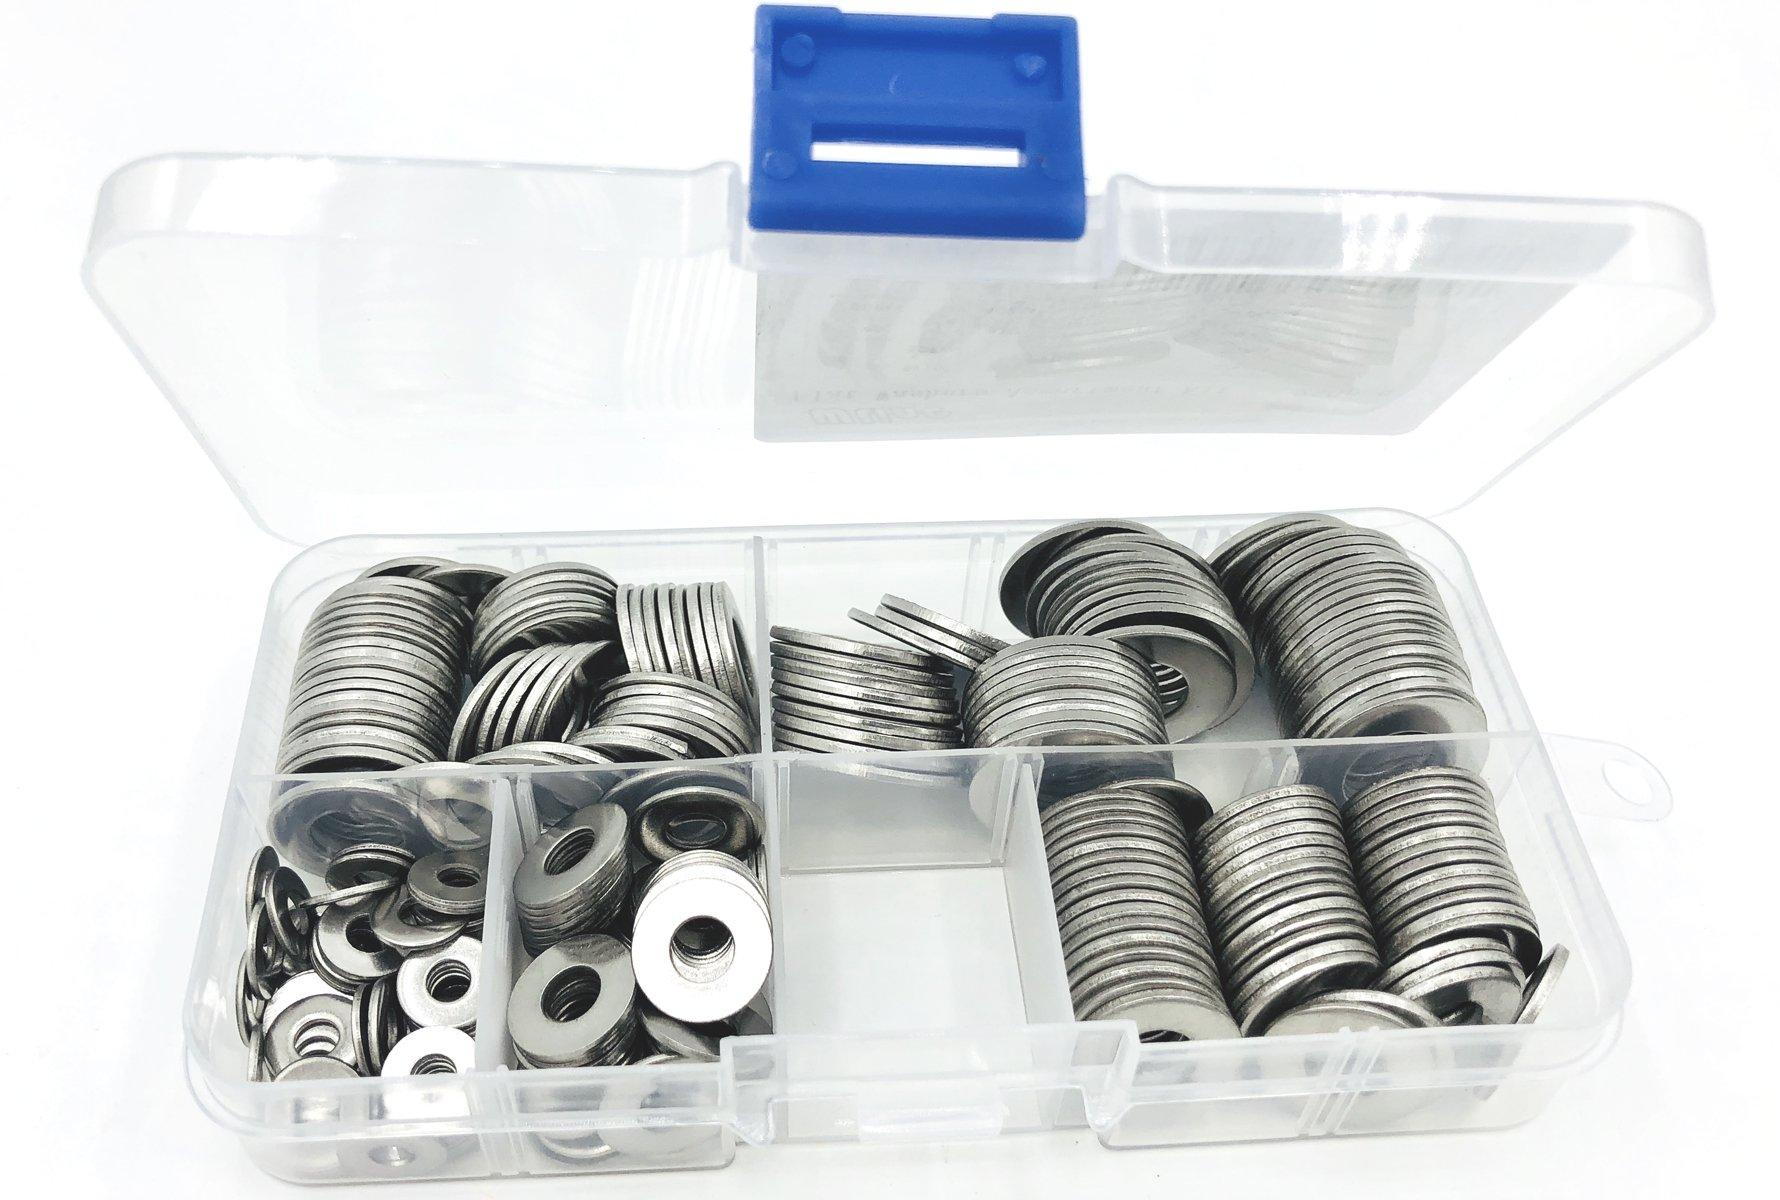 WLine 5 Sizes 3/8'' 5/16'' 1/4'' 10# 6#, 18-8 (304) Stainless Steel Flat Washers Assortment Kit, 250pcs